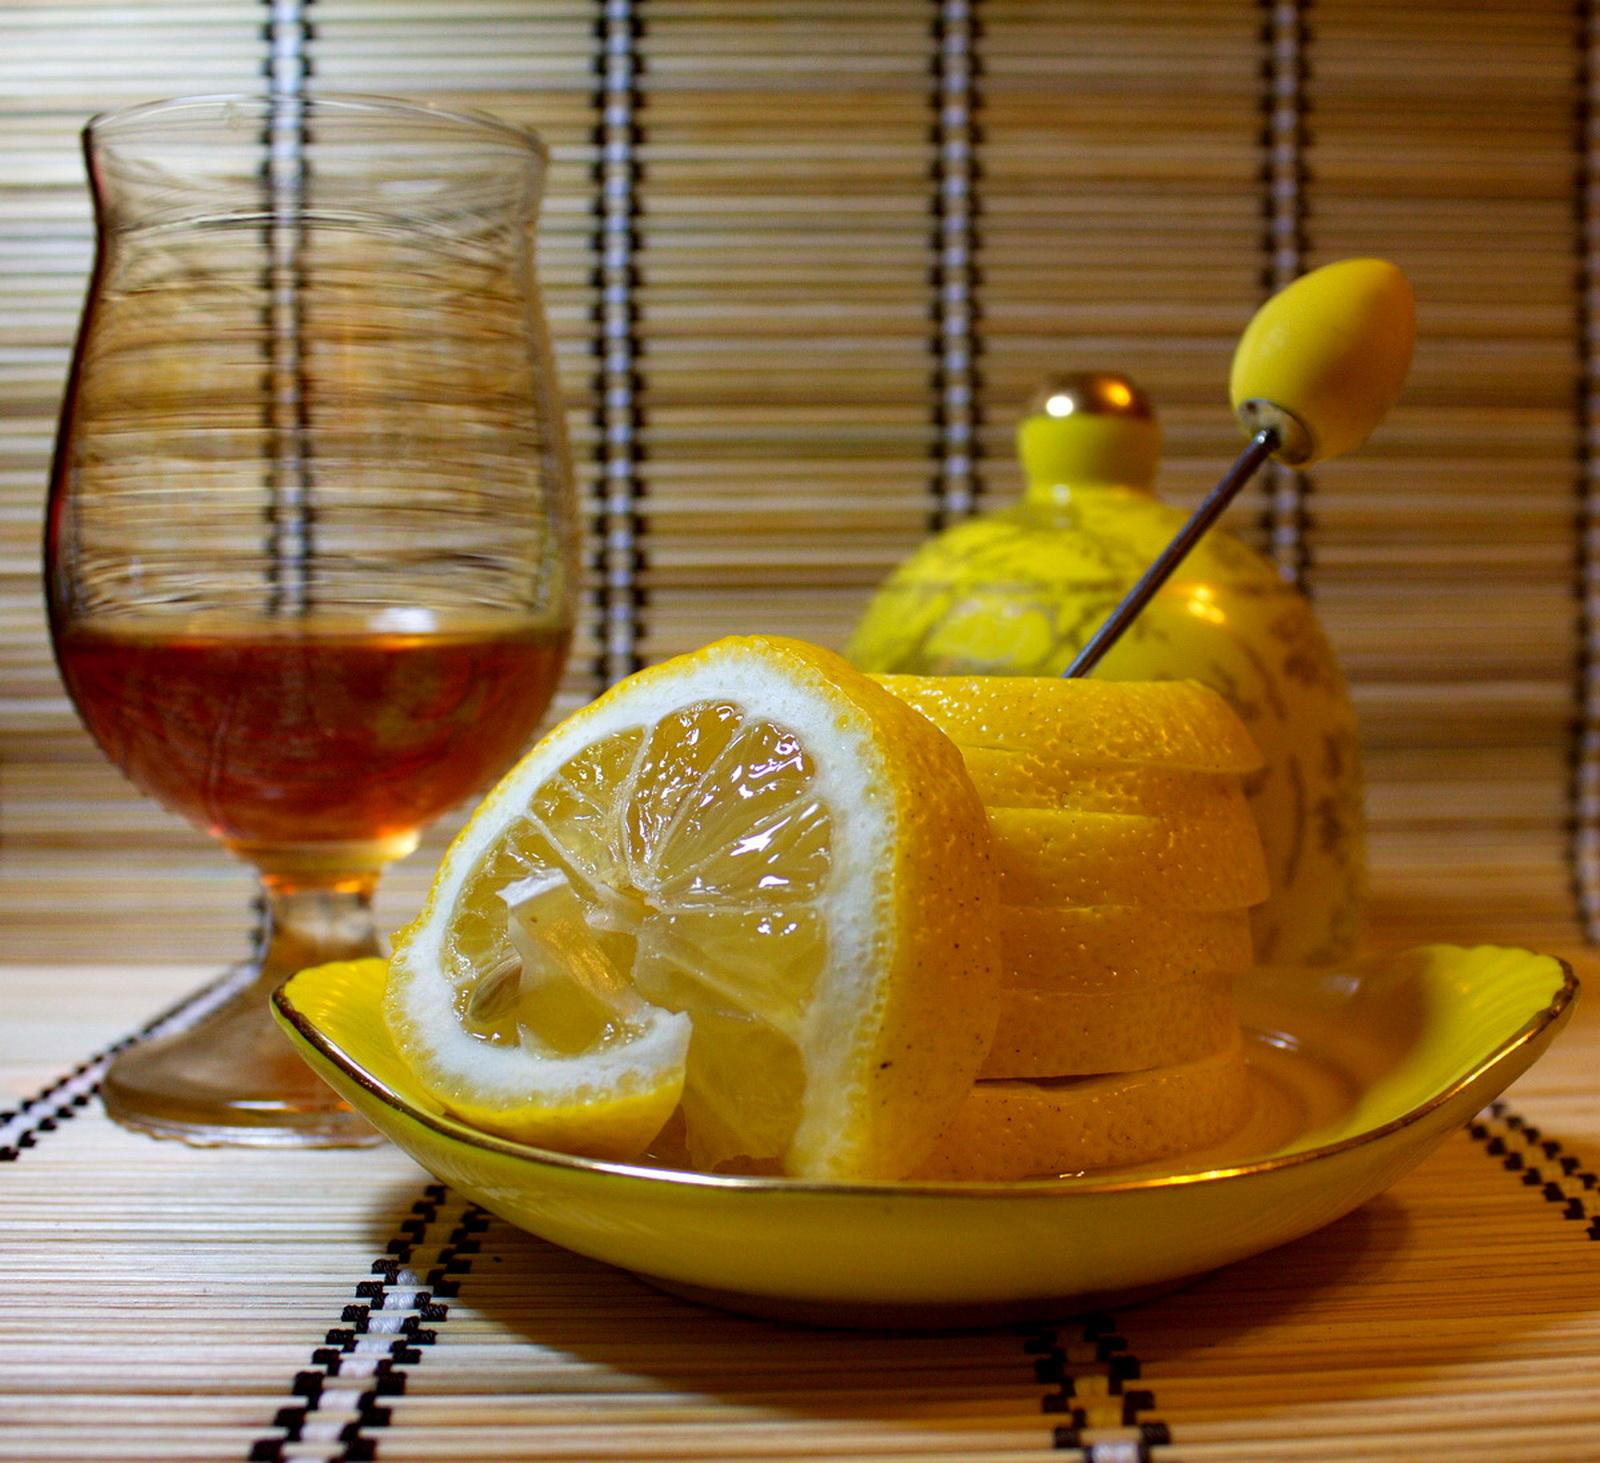 Лимон и коньяк картинки